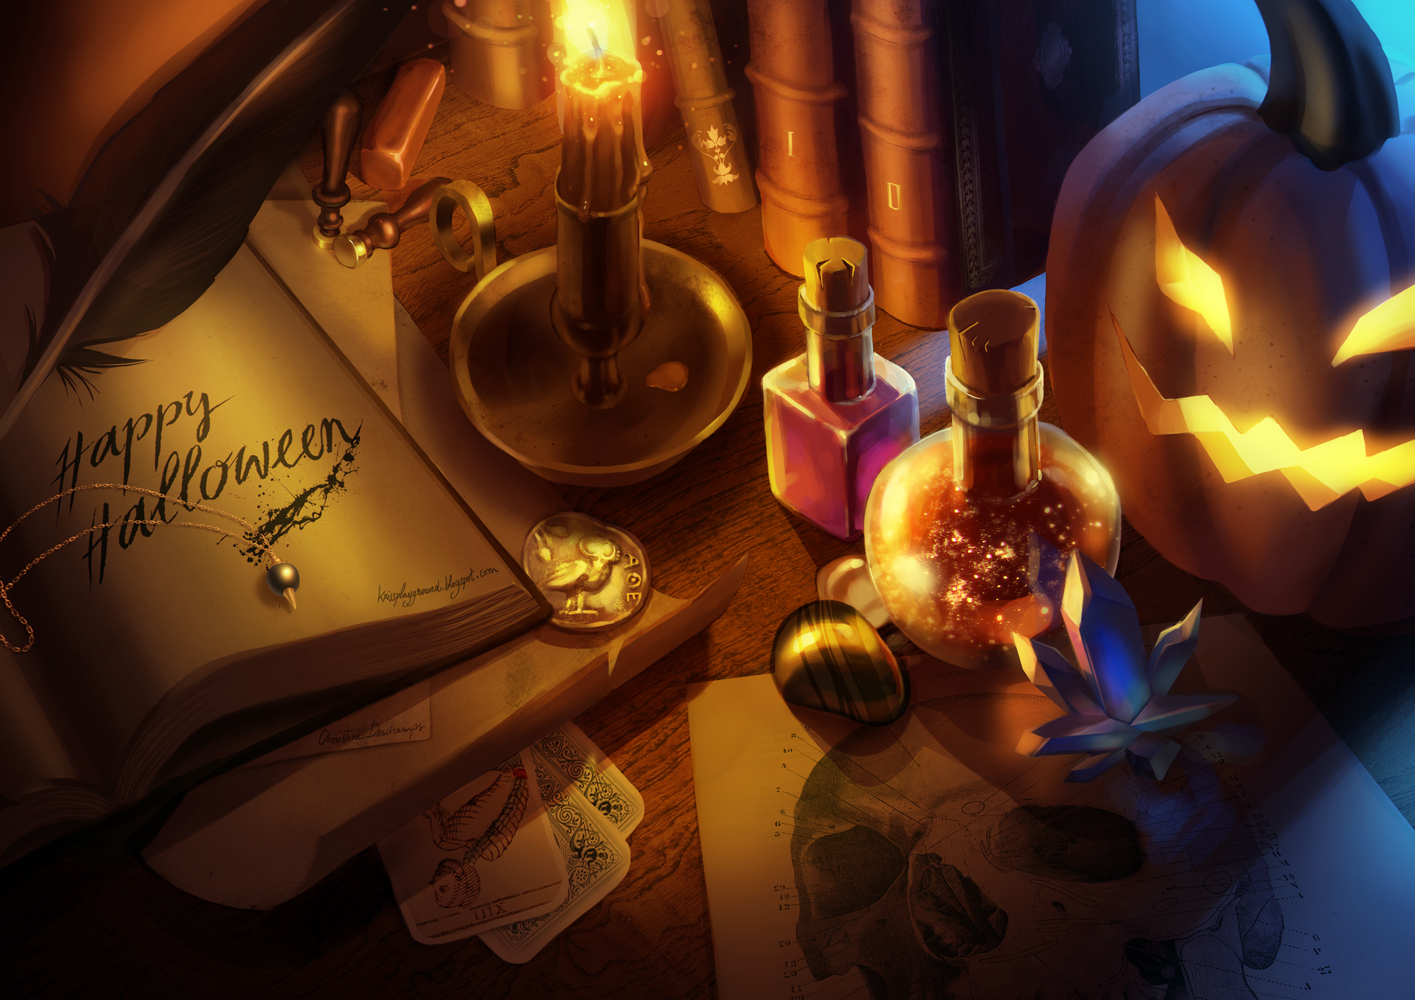 happy halloween by absinthe girl